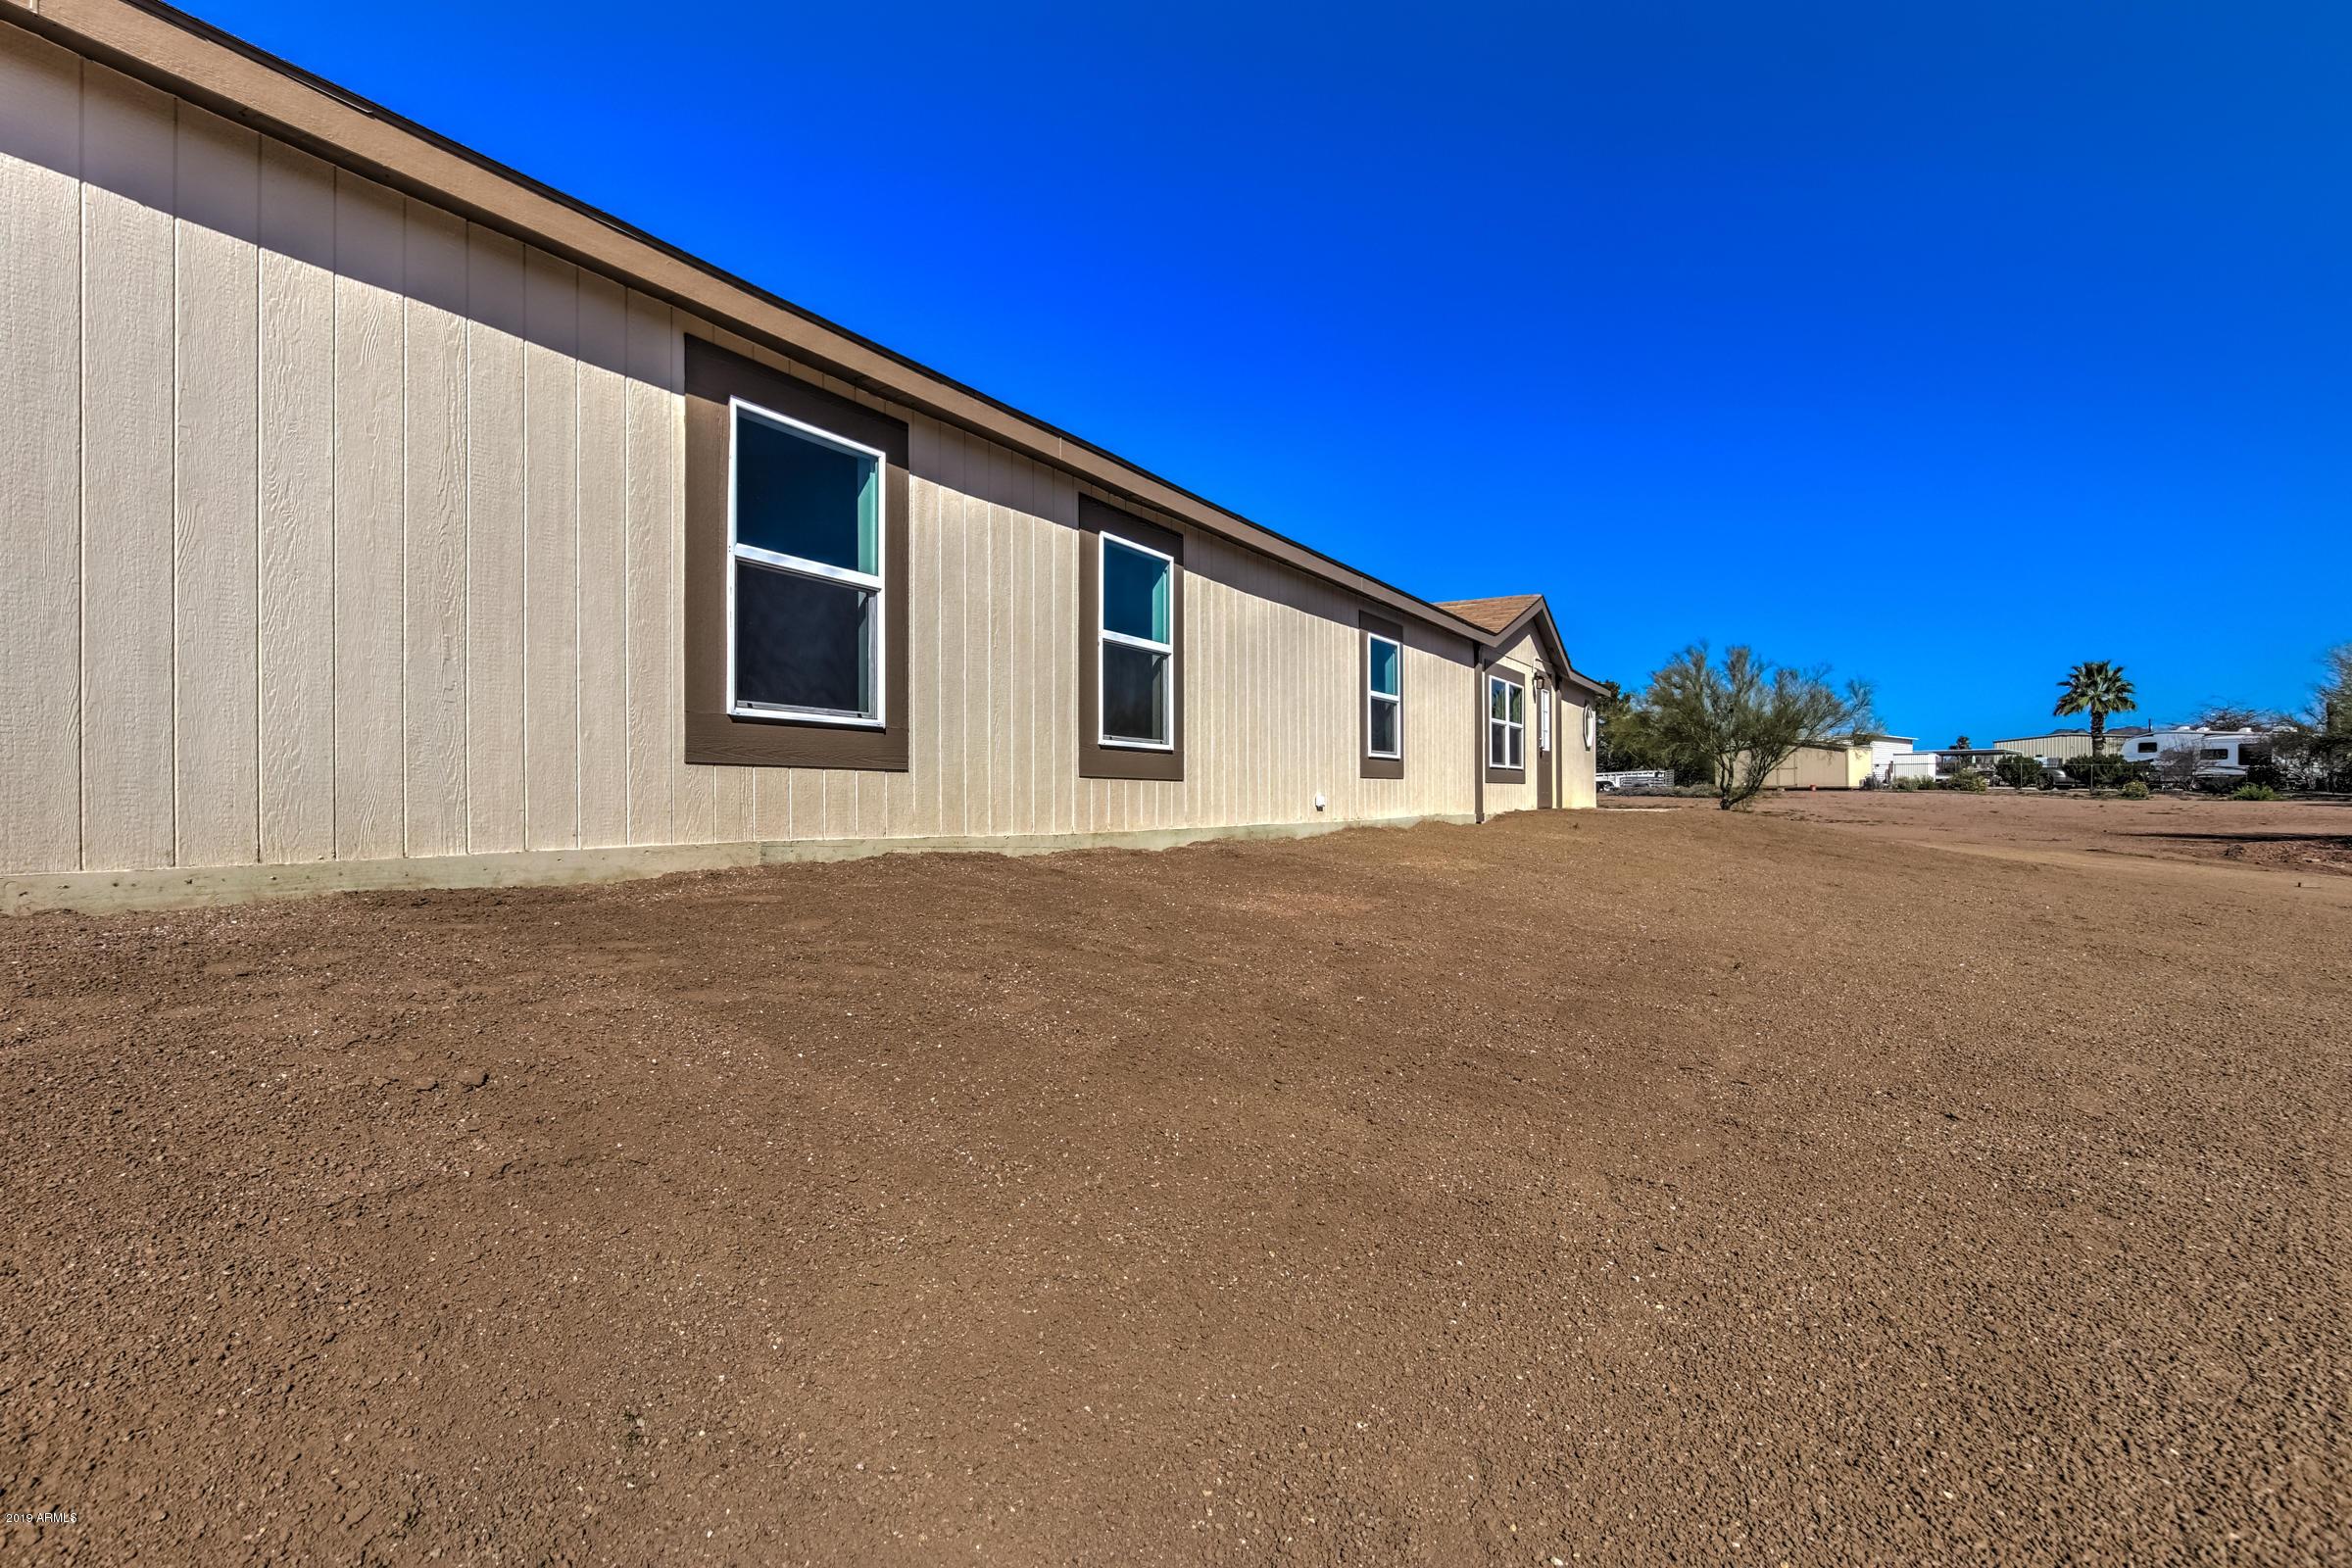 MLS 5898141 1168 S Wickiup Road, Apache Junction, AZ 85119 Apache Junction AZ Manufactured Mobile Home